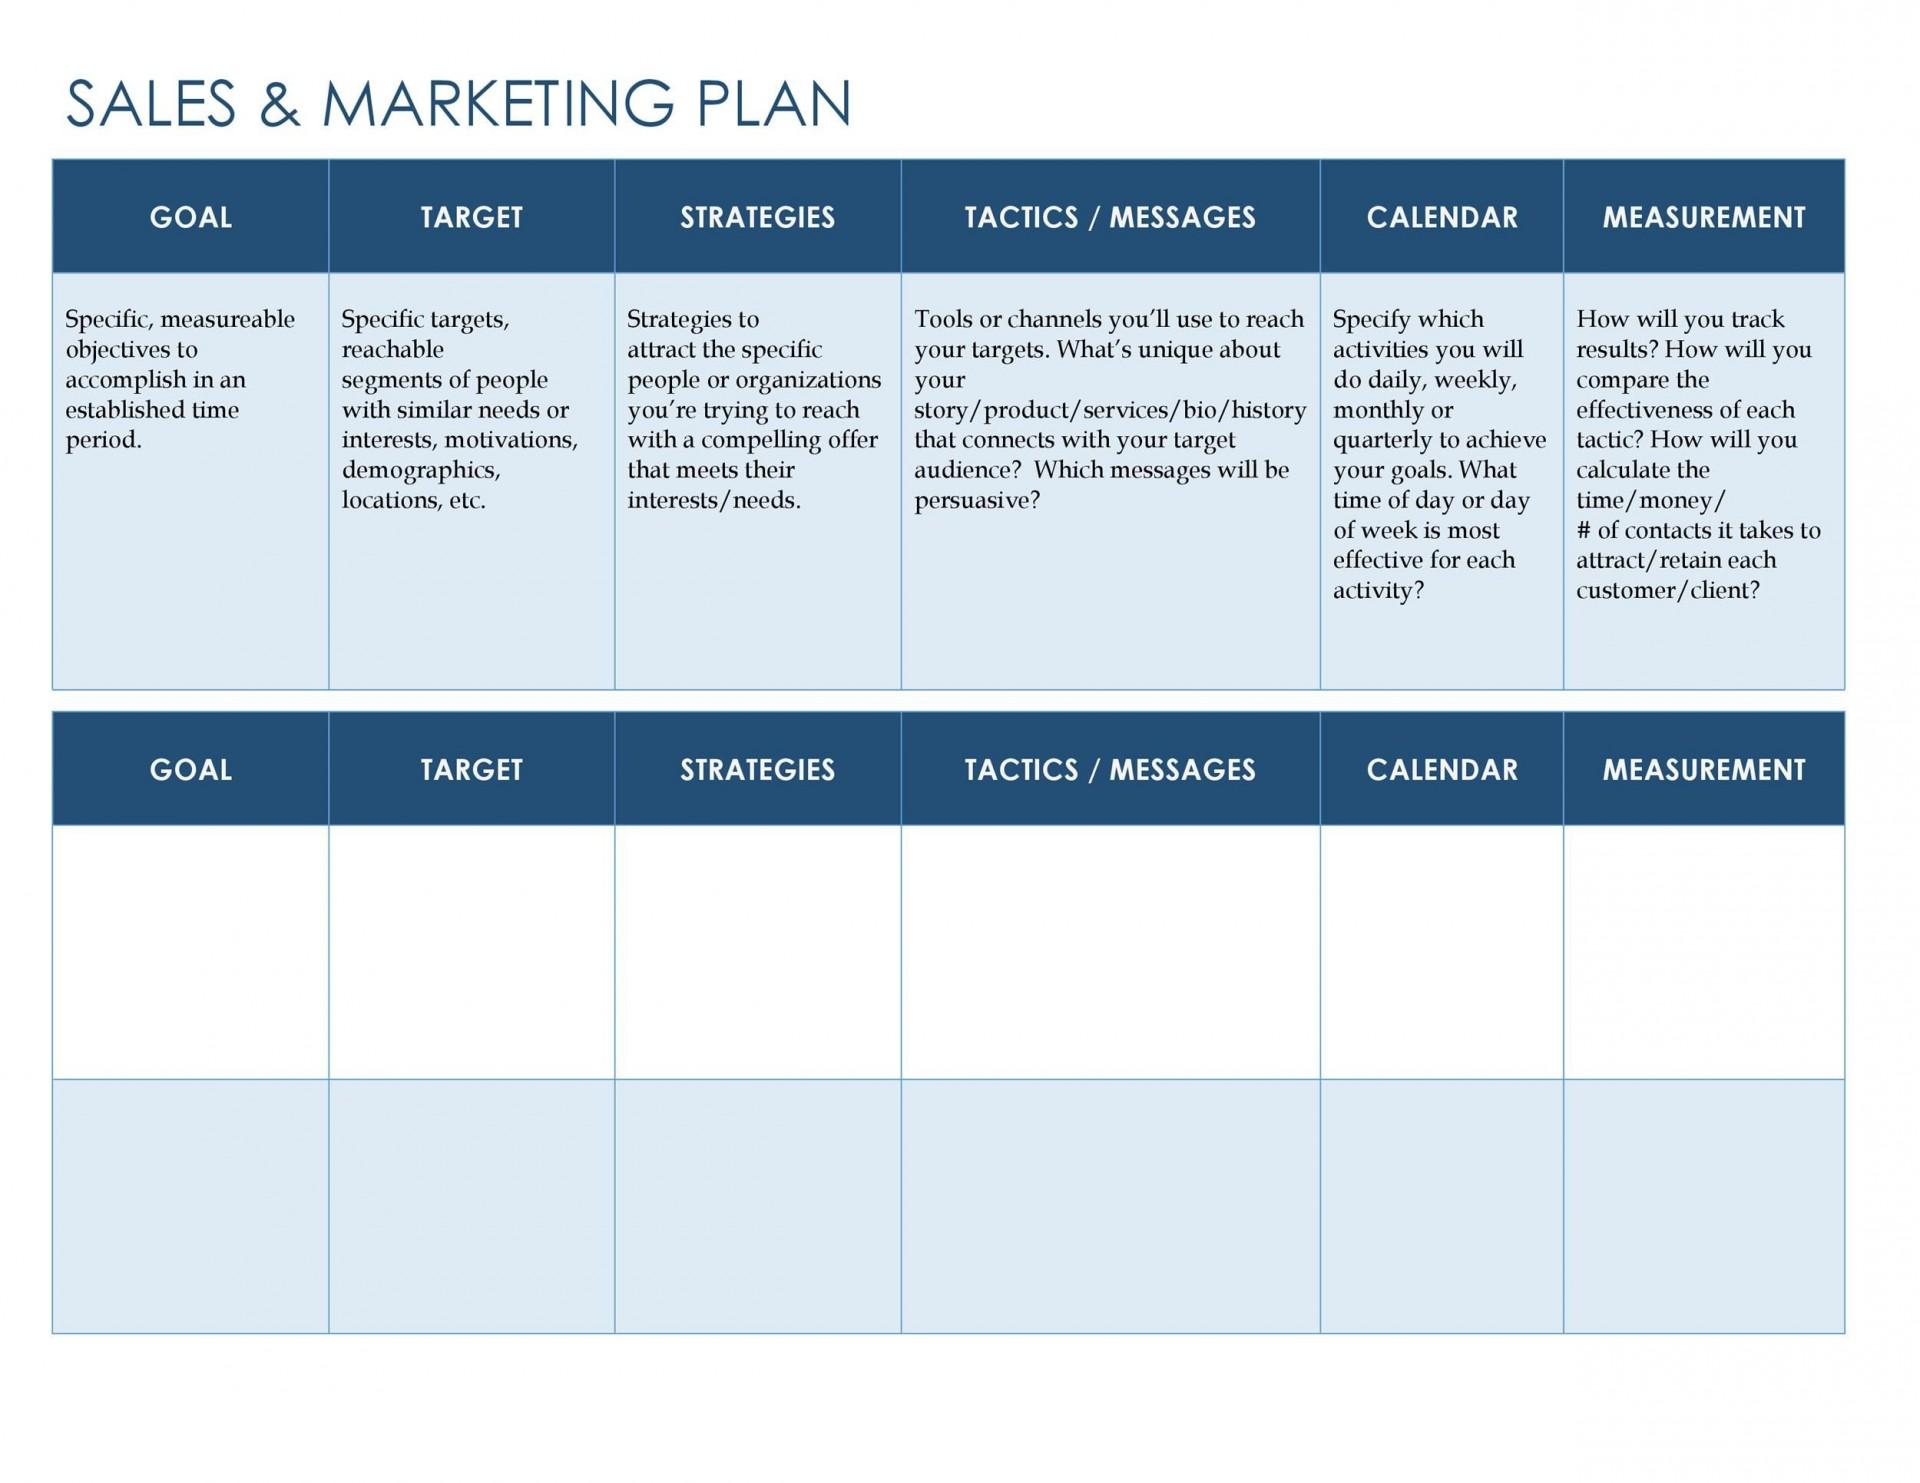 008 Shocking Strategic Plan Template Excel Design  Action Communication1920